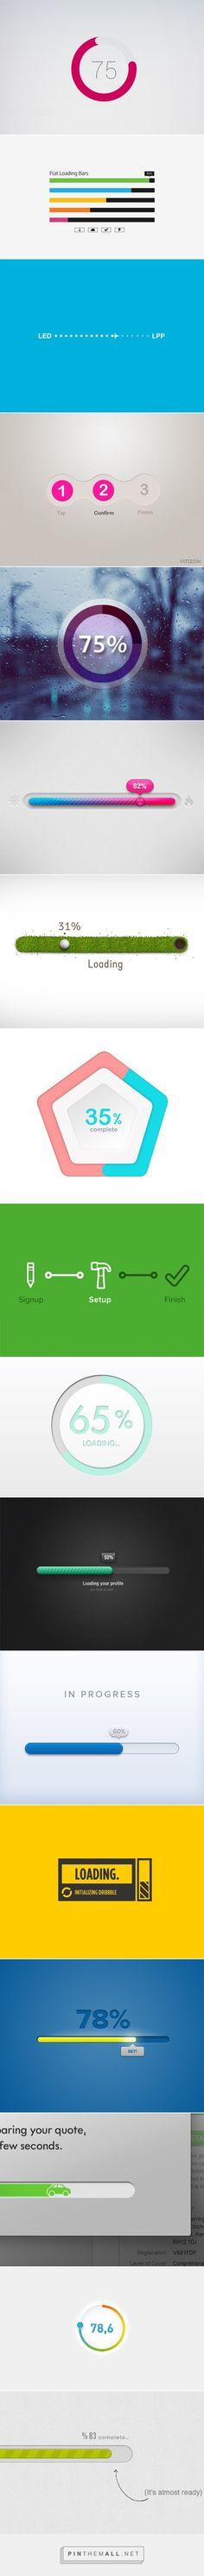 Loading Bar Designs - created via https://pinthemall.net